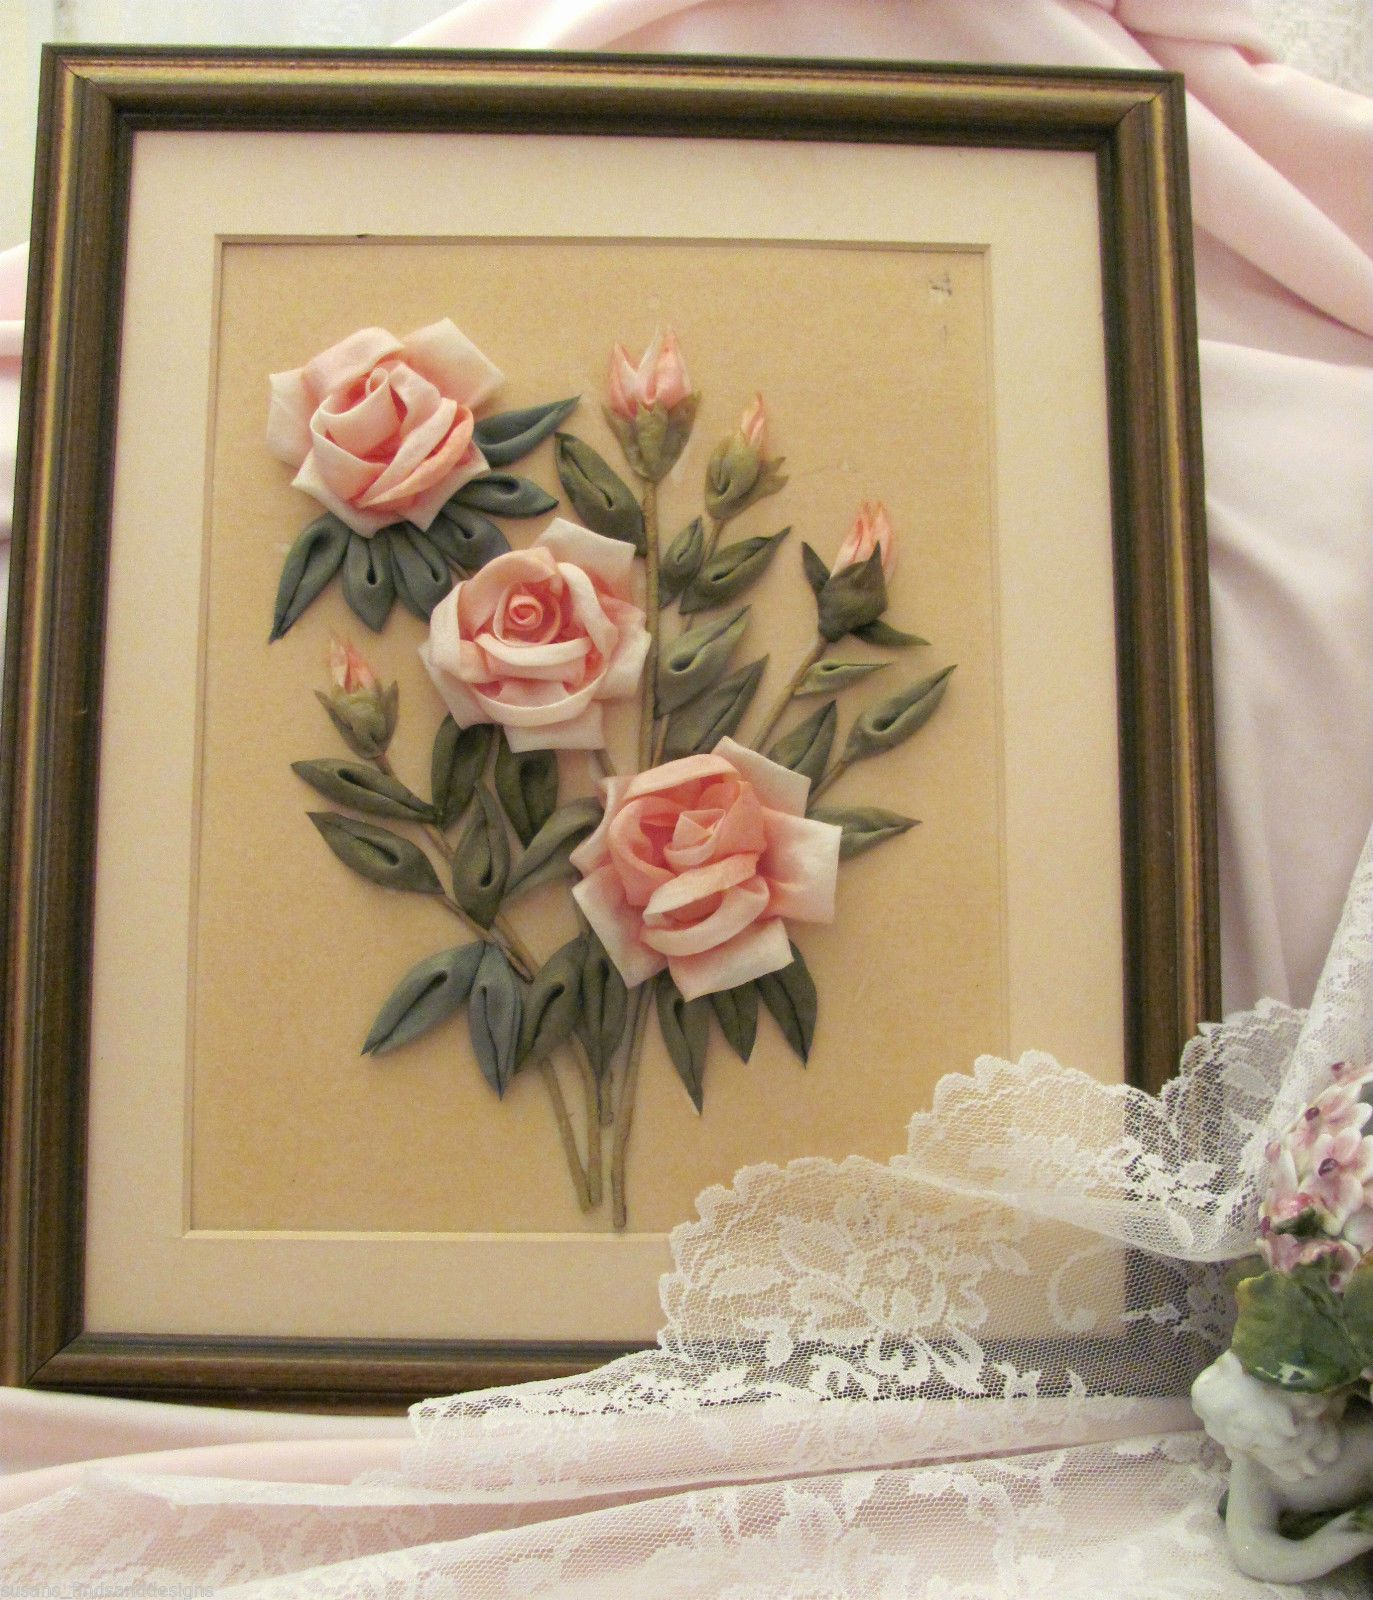 Ribbon work picture pink roses flower frame silk floral